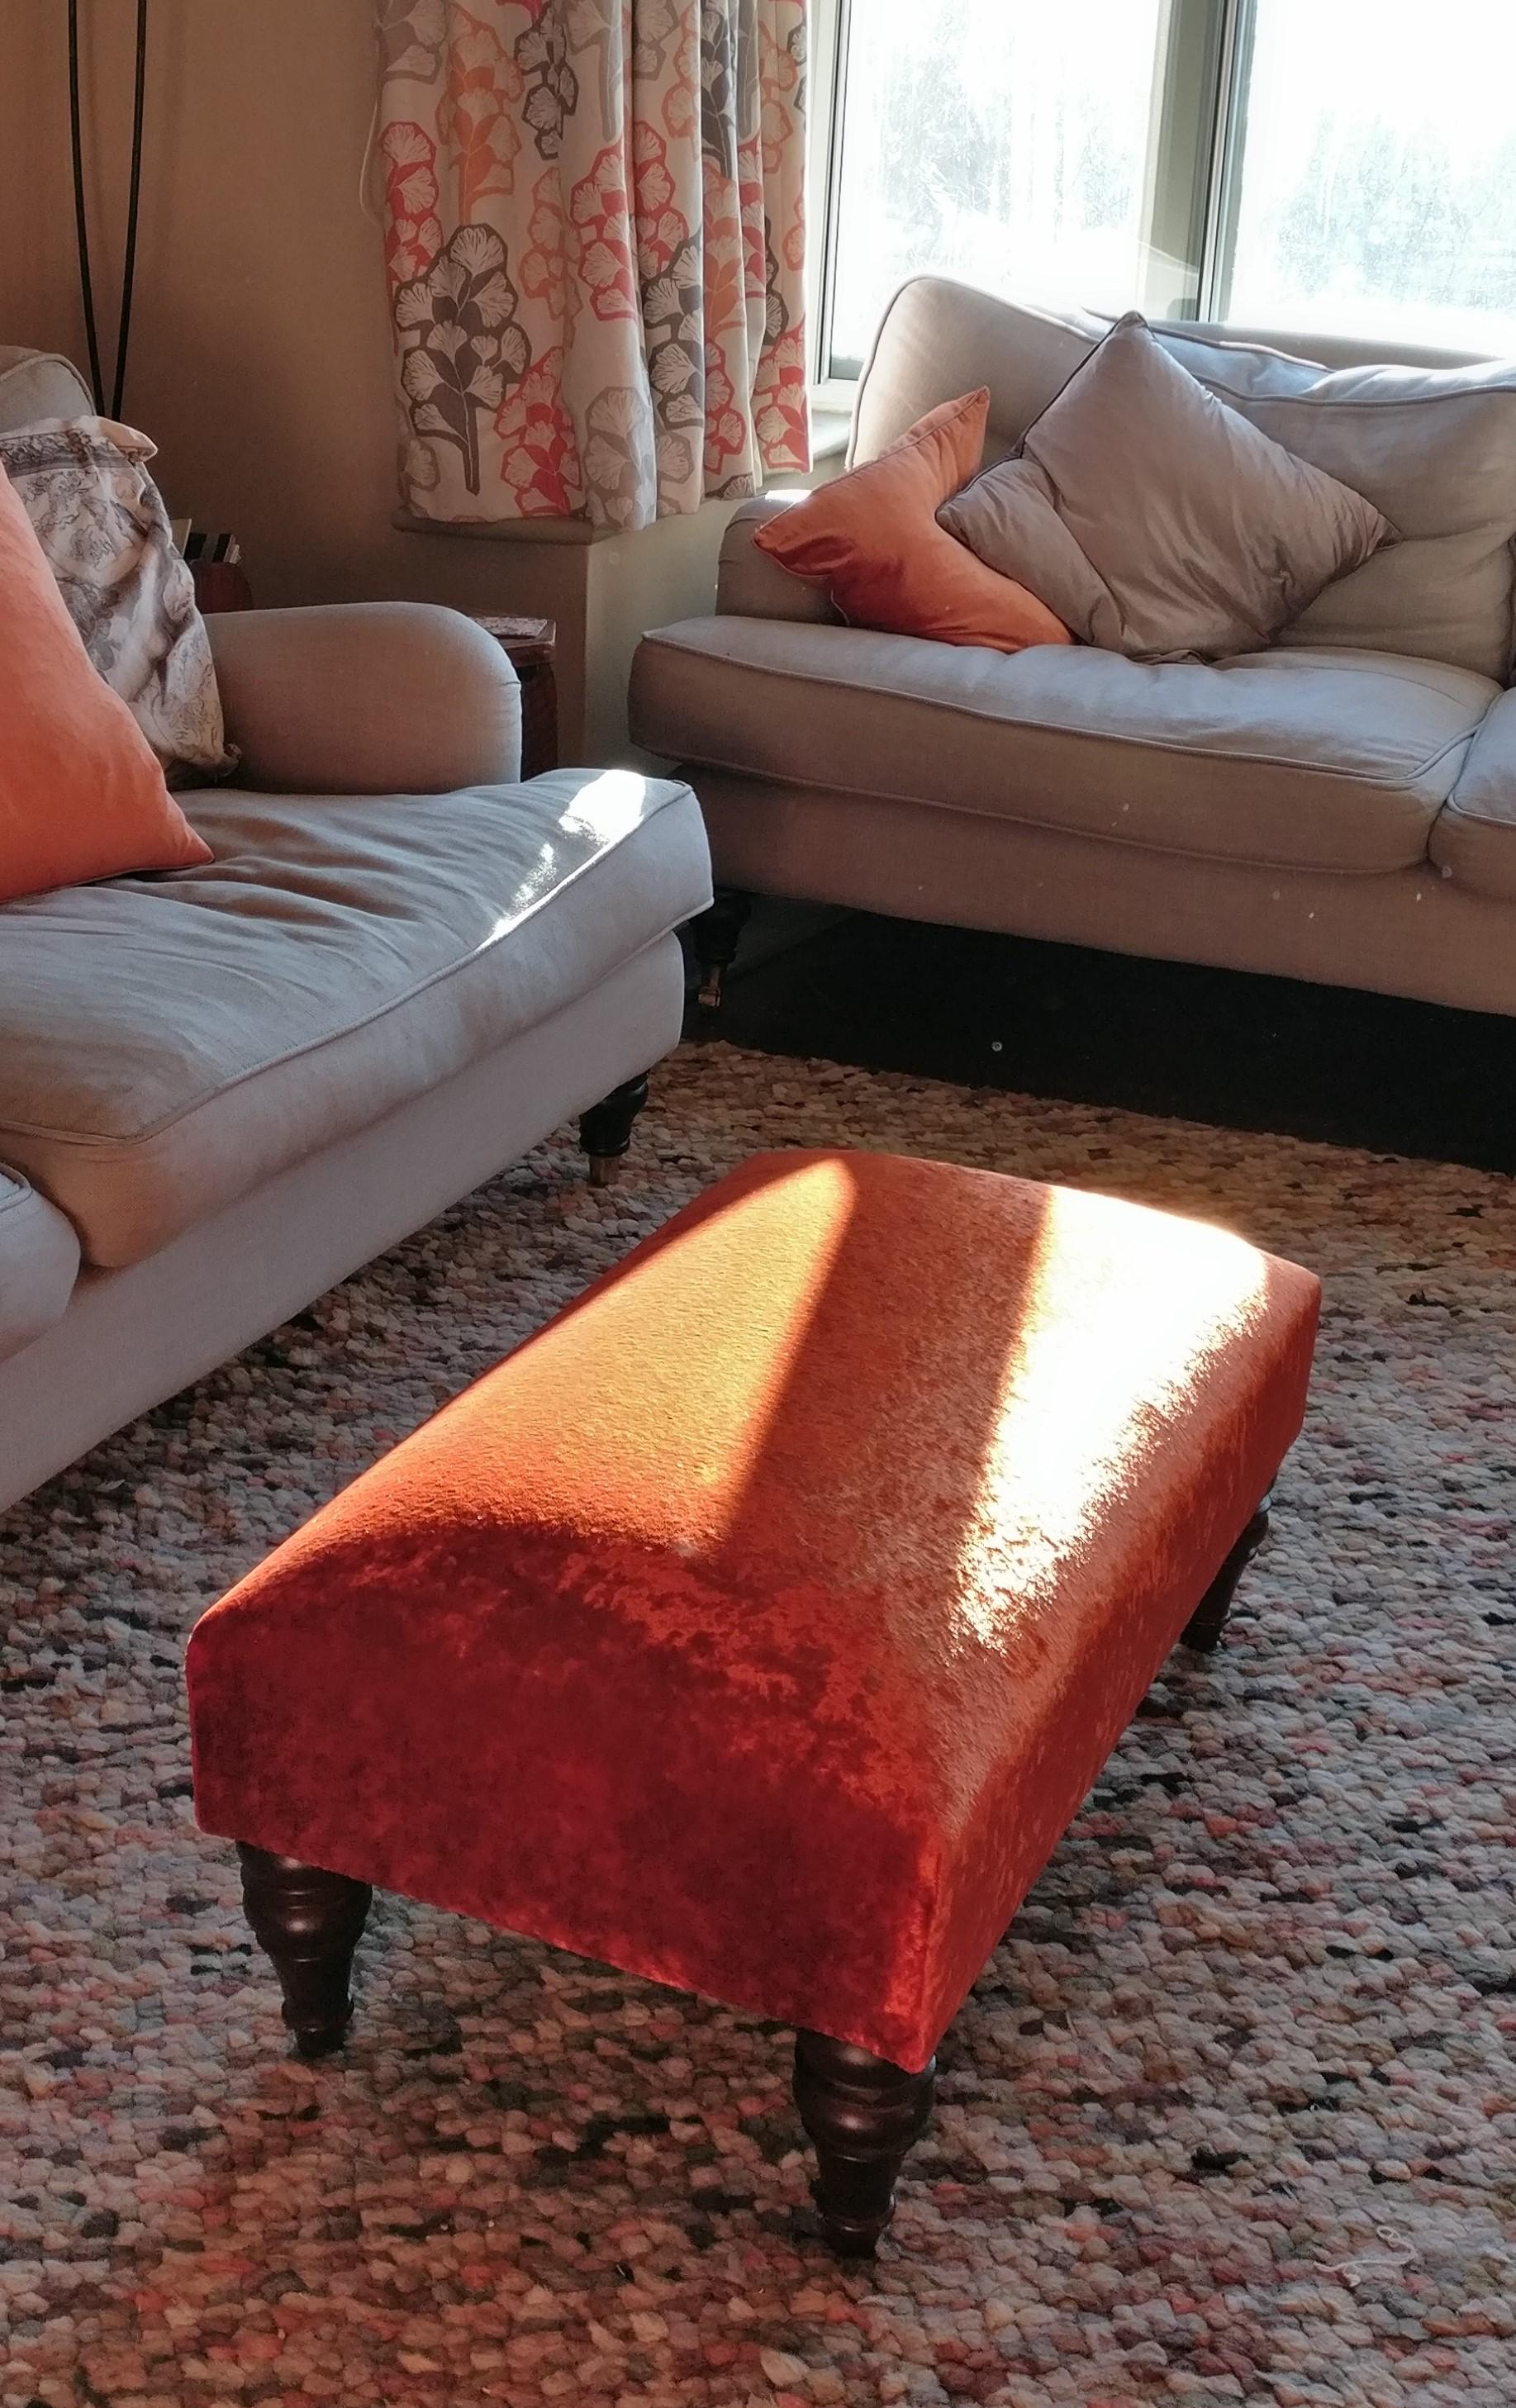 Grist & Twine Upholstery: Footstool reupholstered in orange crushed velvet